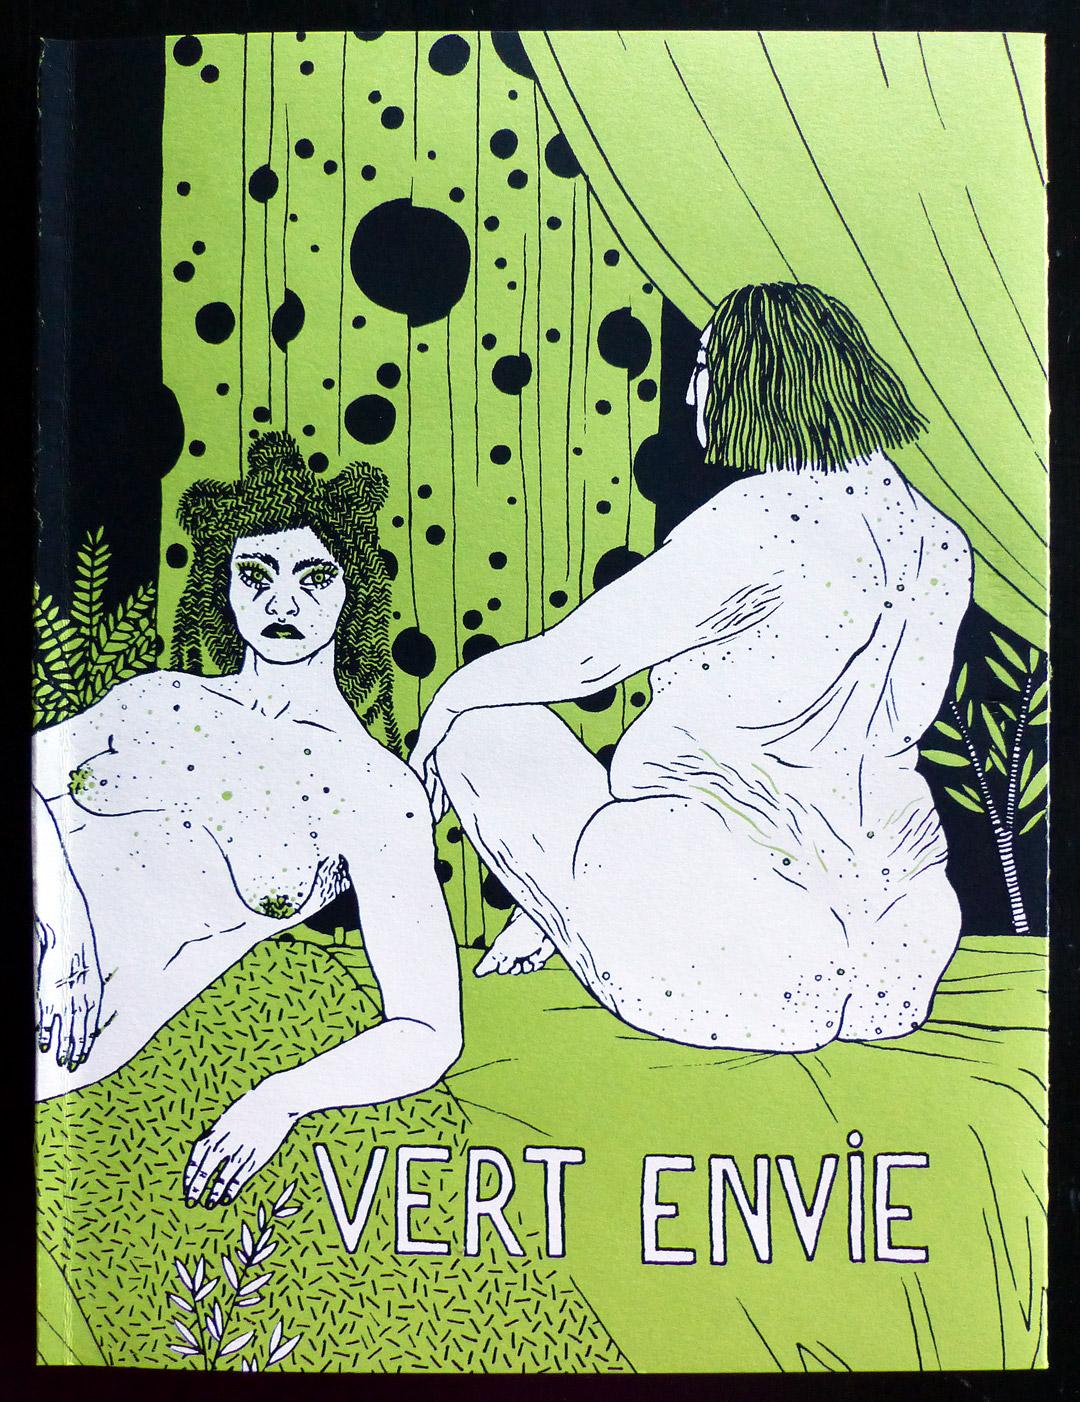 VertEnvie_face